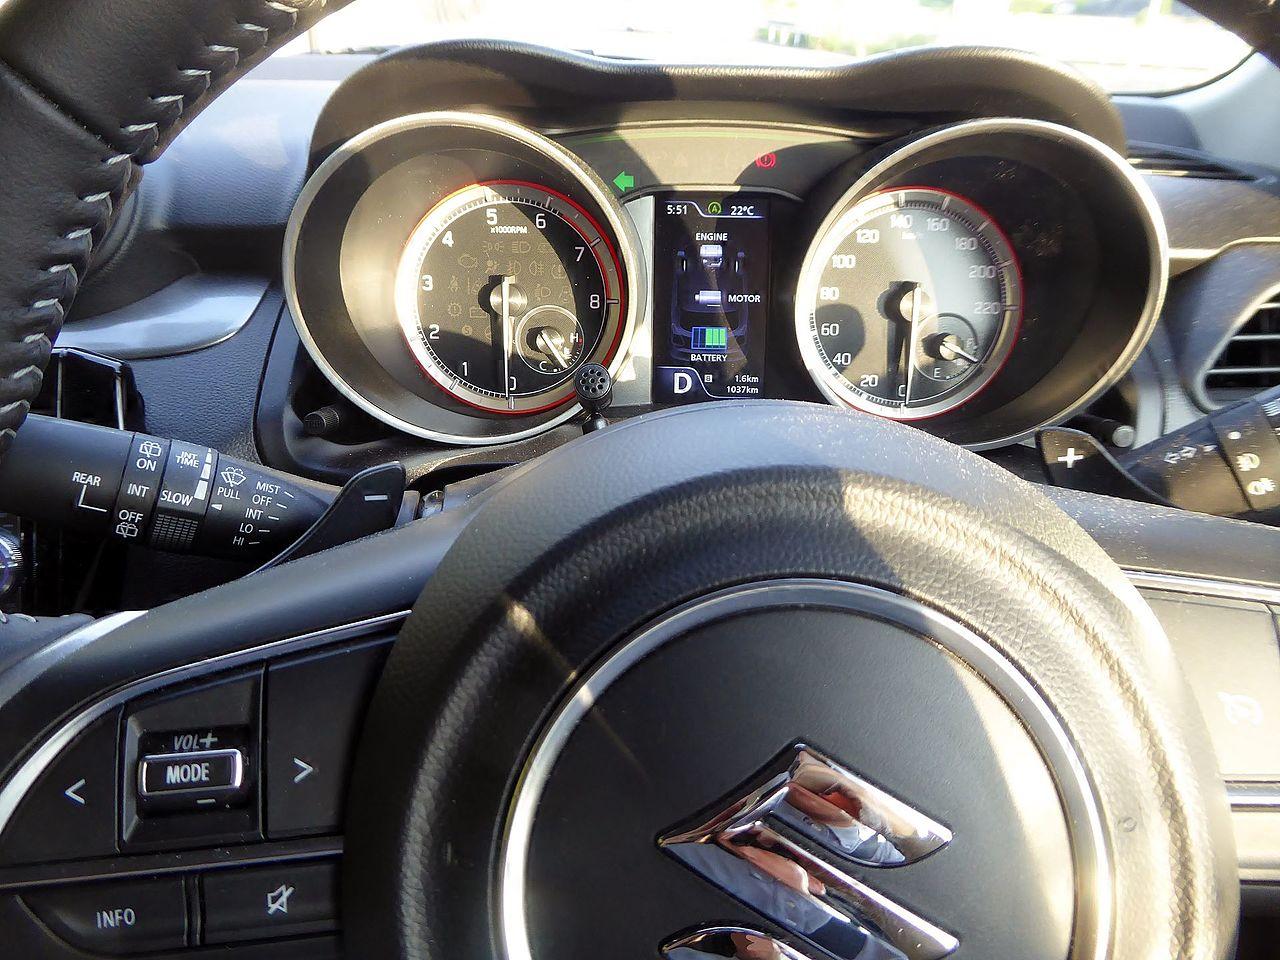 File:The meter of Suzuki SWIFT HYBRID RS 2WD (DAA-ZC53S-VBRB